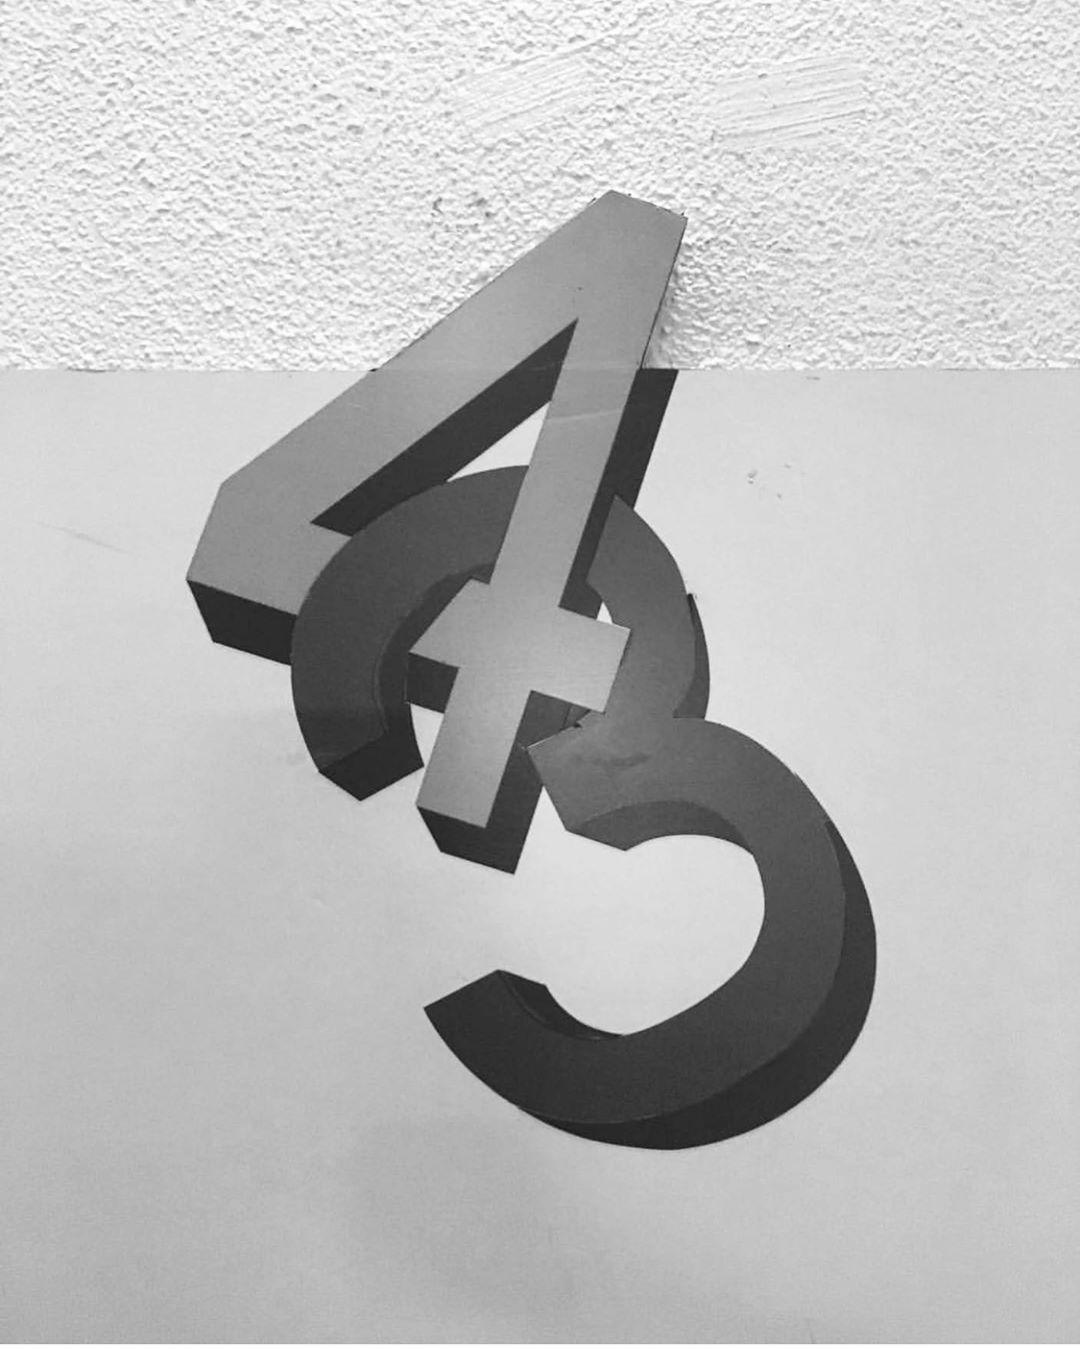 4th/3rd floor signage. Sasakuza Bowl Alley. — @chillllllllll week on #copiercollerclub